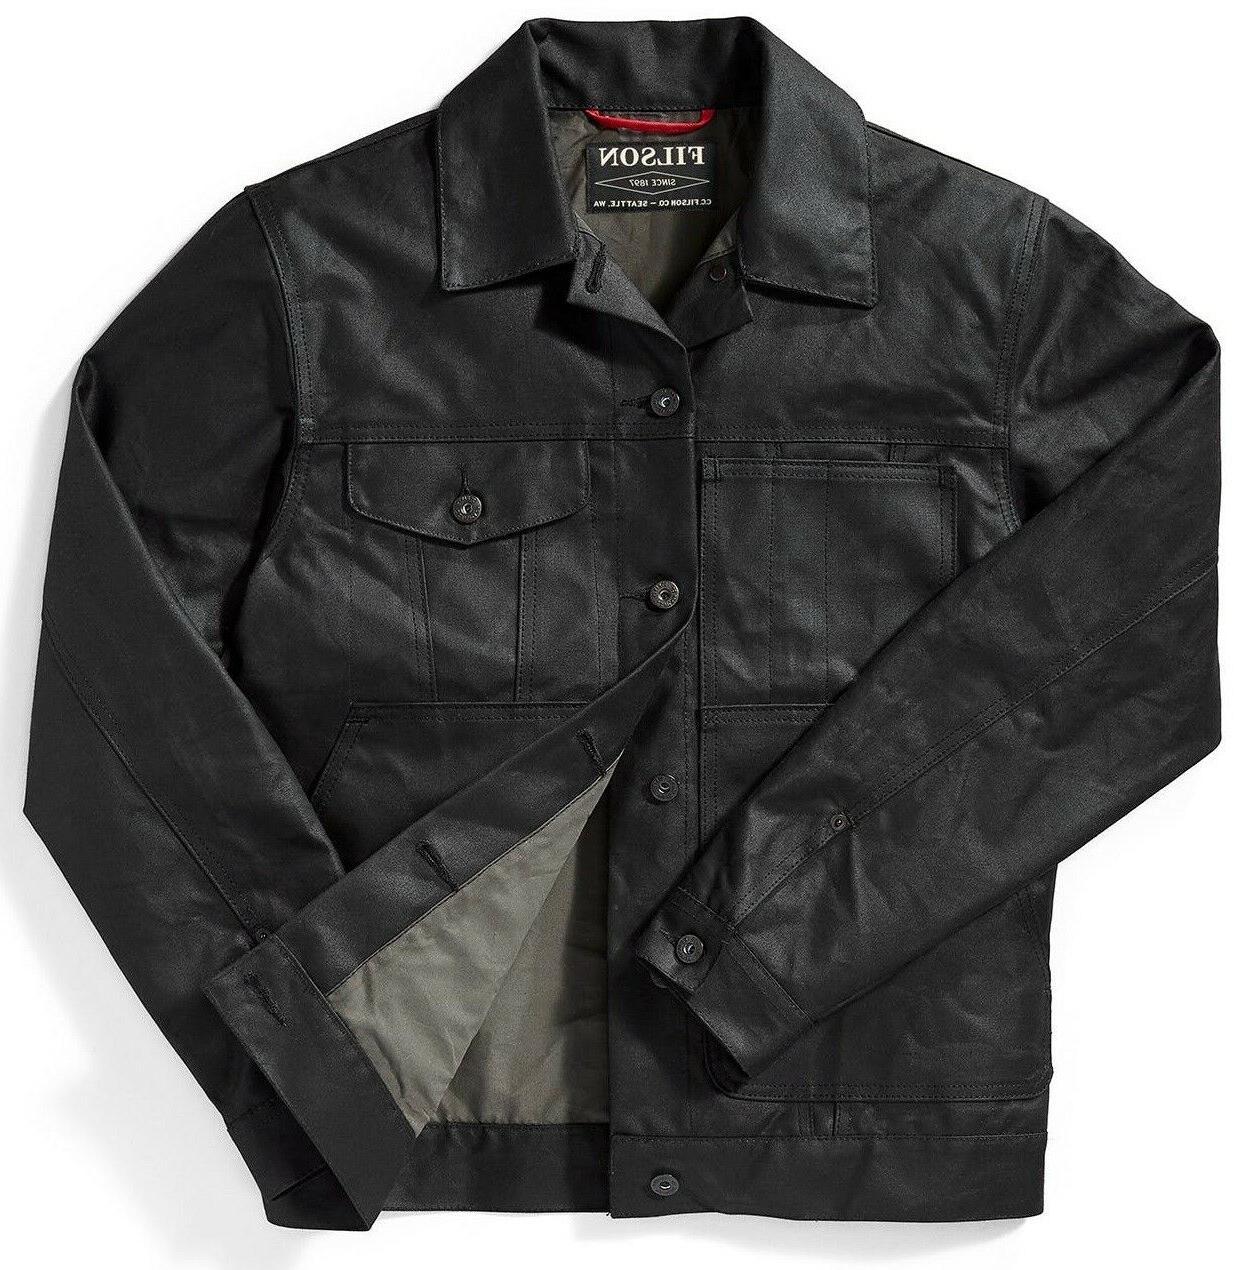 Filson Tin Lined Limited Jacket Black XS MSRP